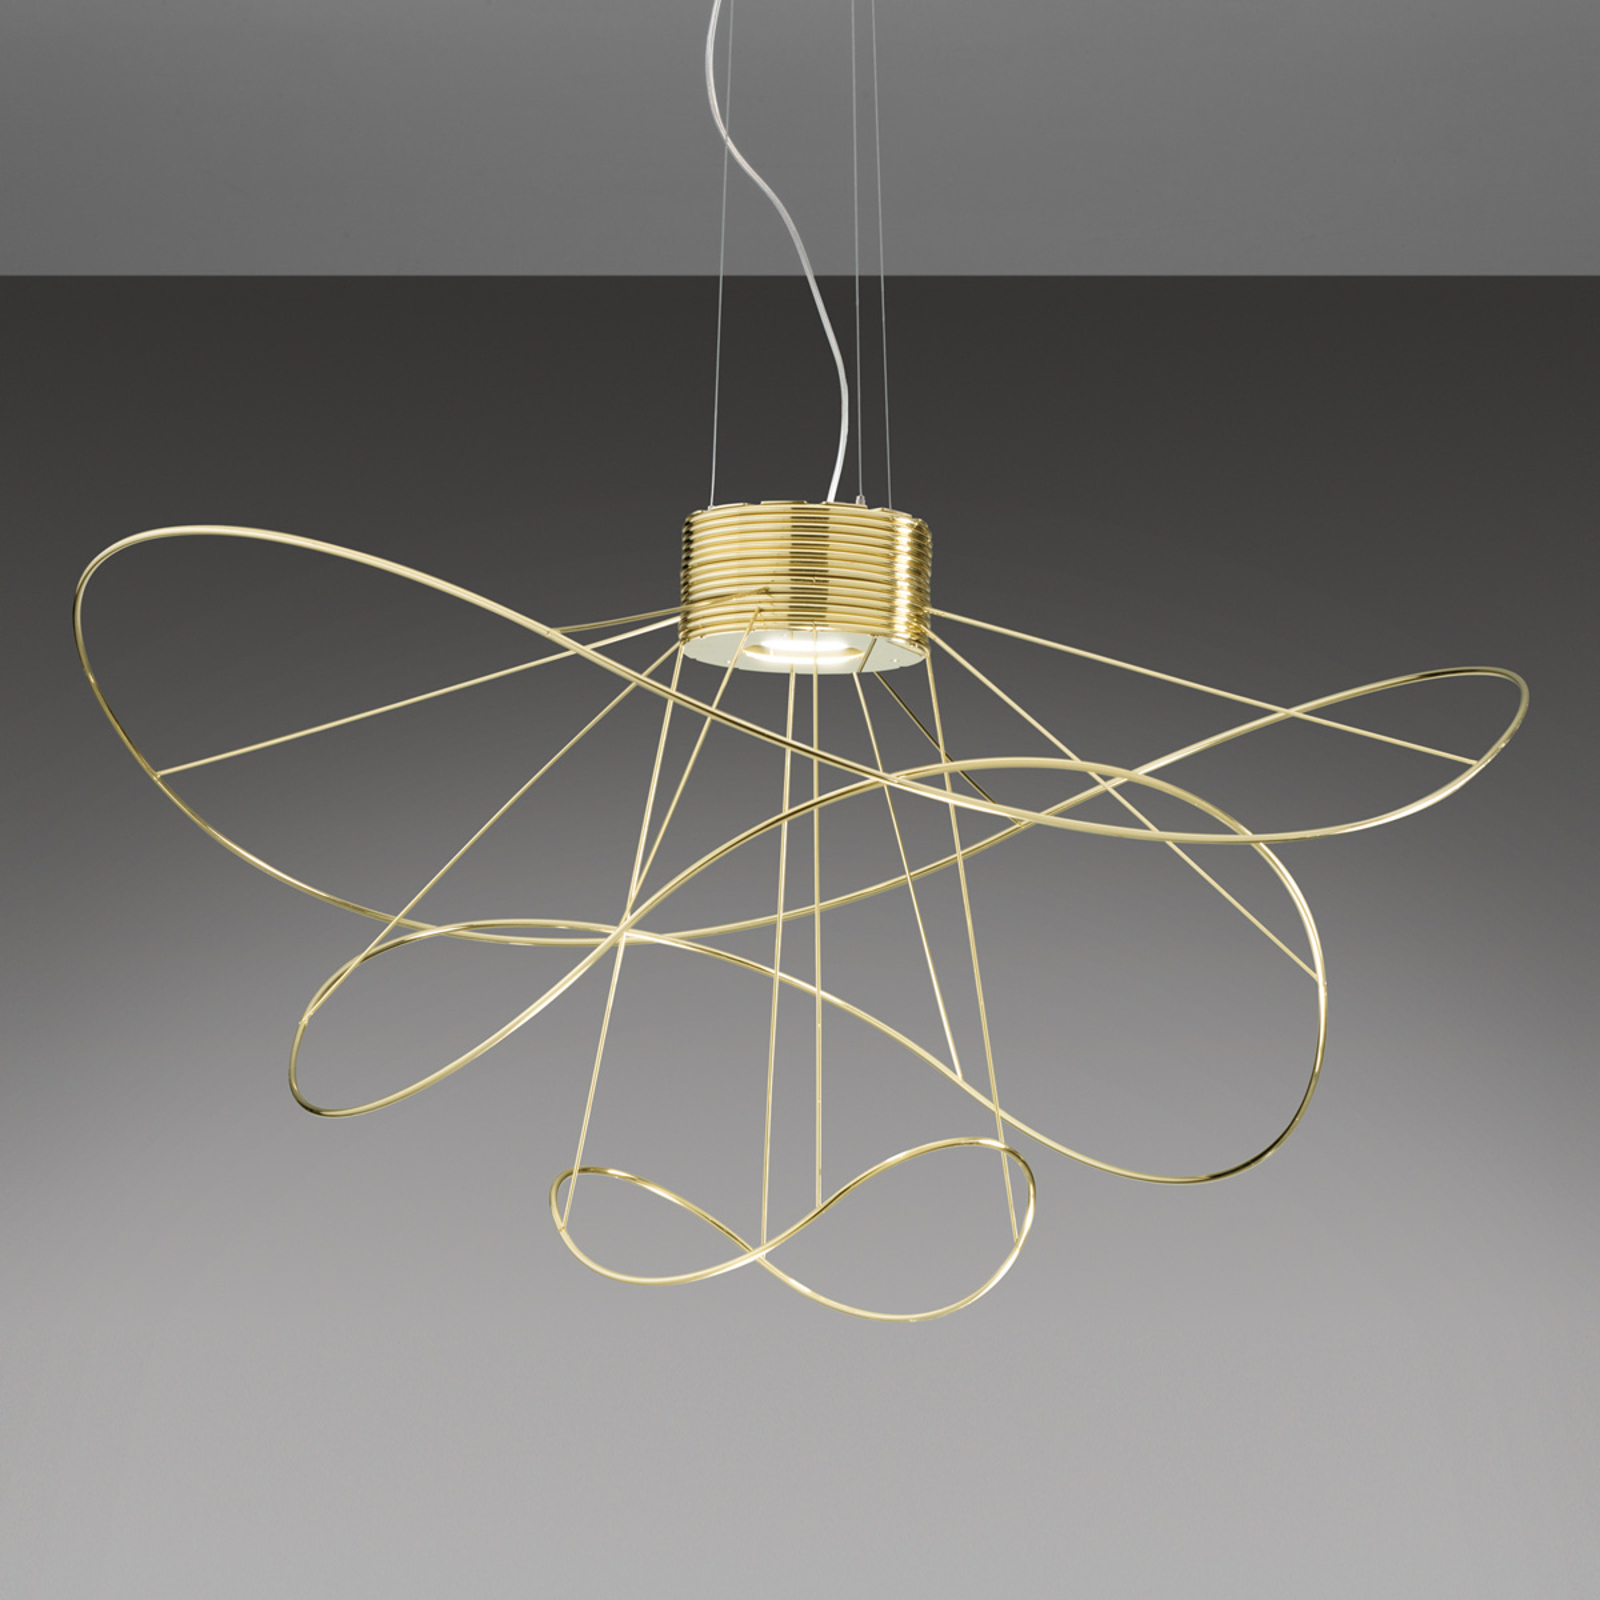 Axolight Hoops 3 lampa wisząca LED, złota